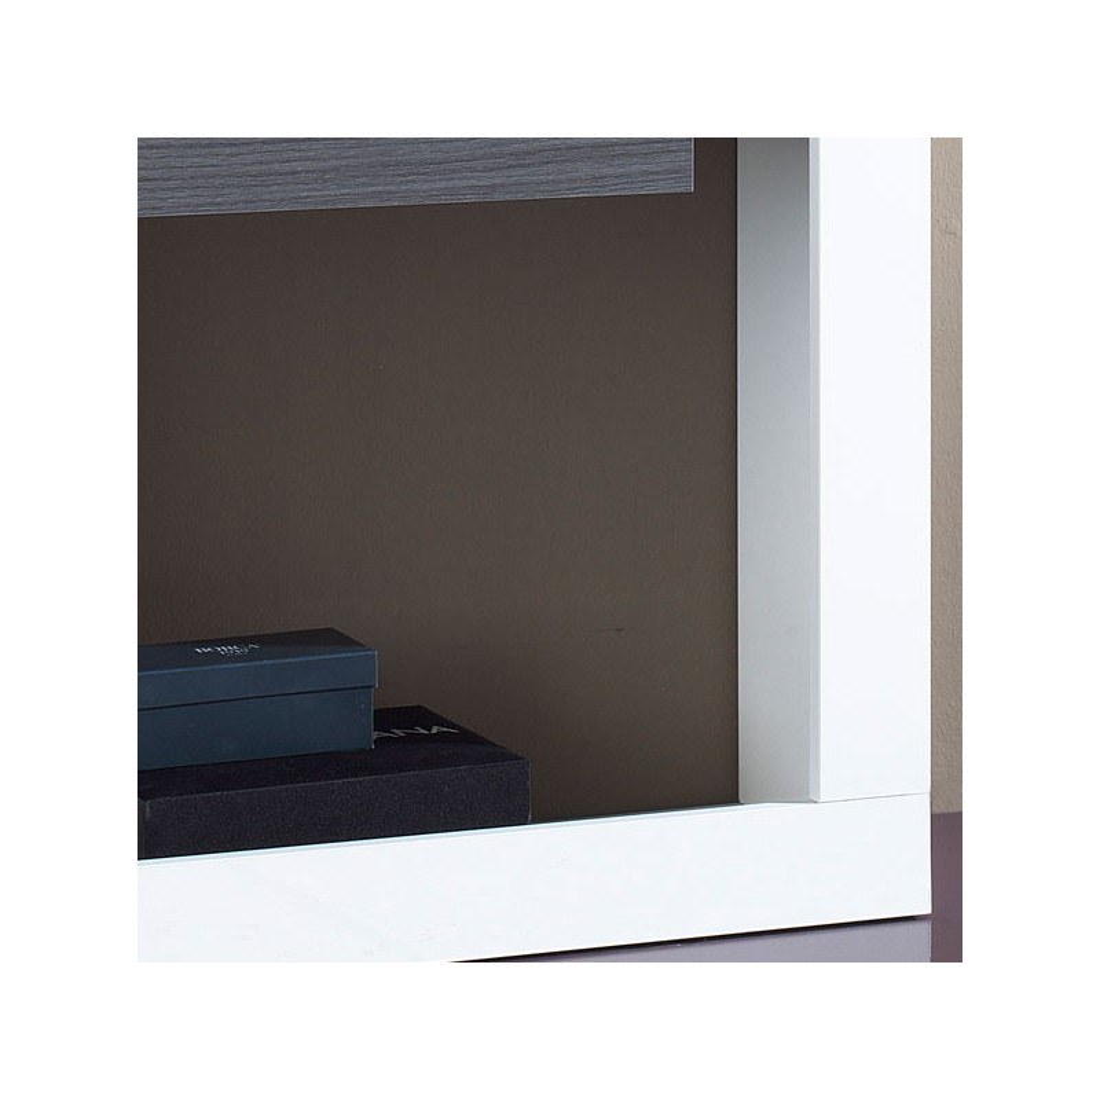 Meuble d 39 entr e blanc cendre miroir neema univers for Miroir sans fond